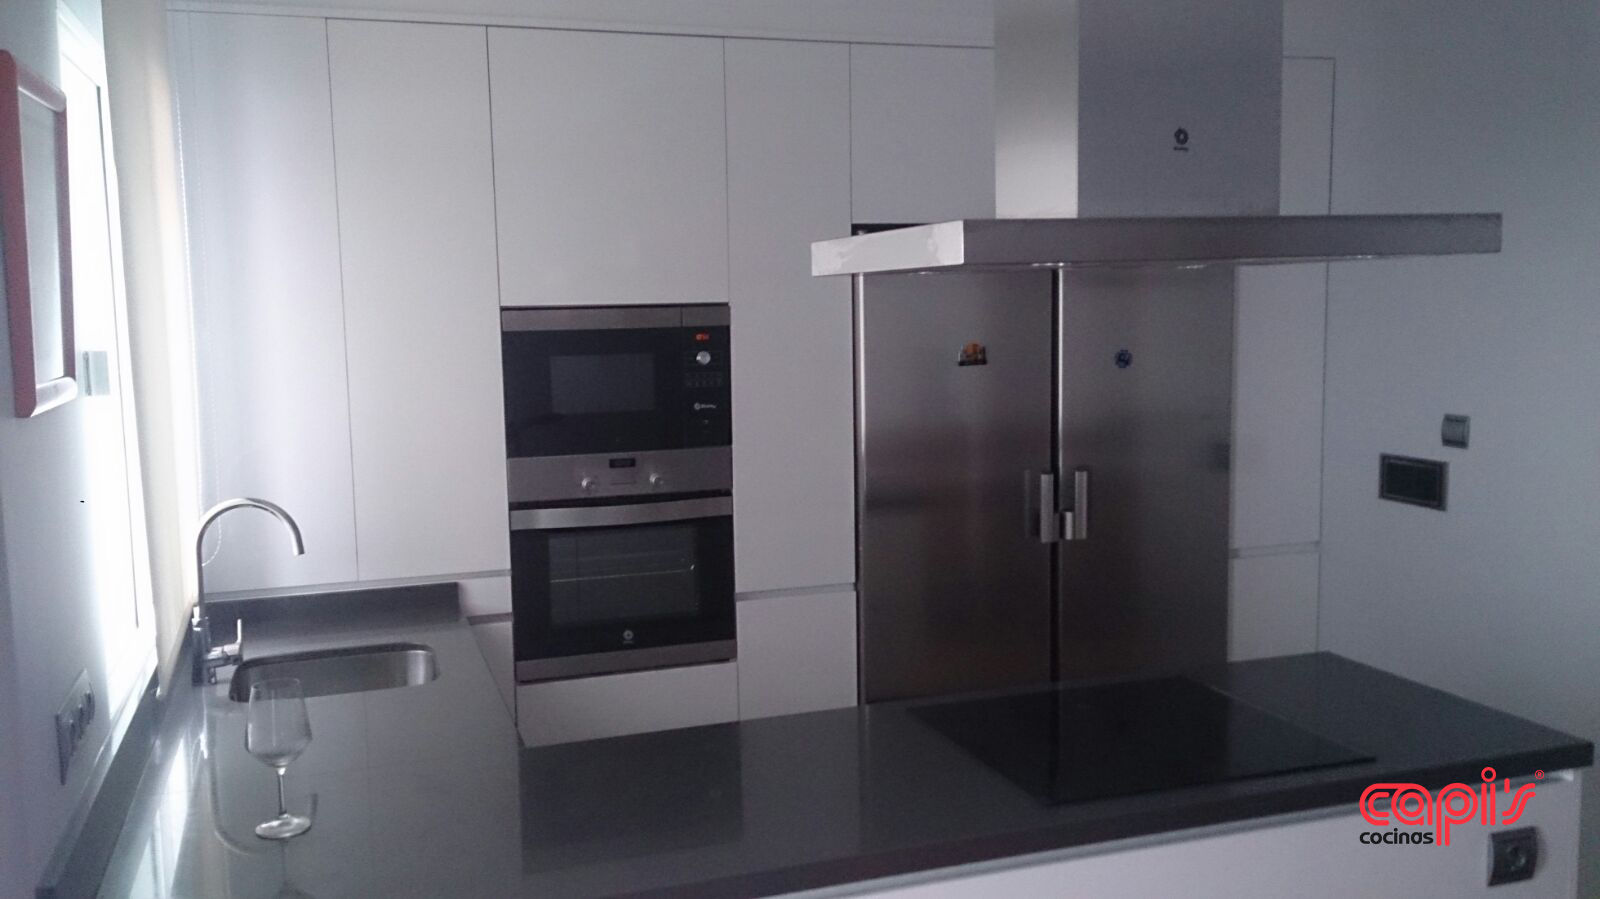 Cocina minimalista con un toque marengo cocinas capis for Silestone gris marengo